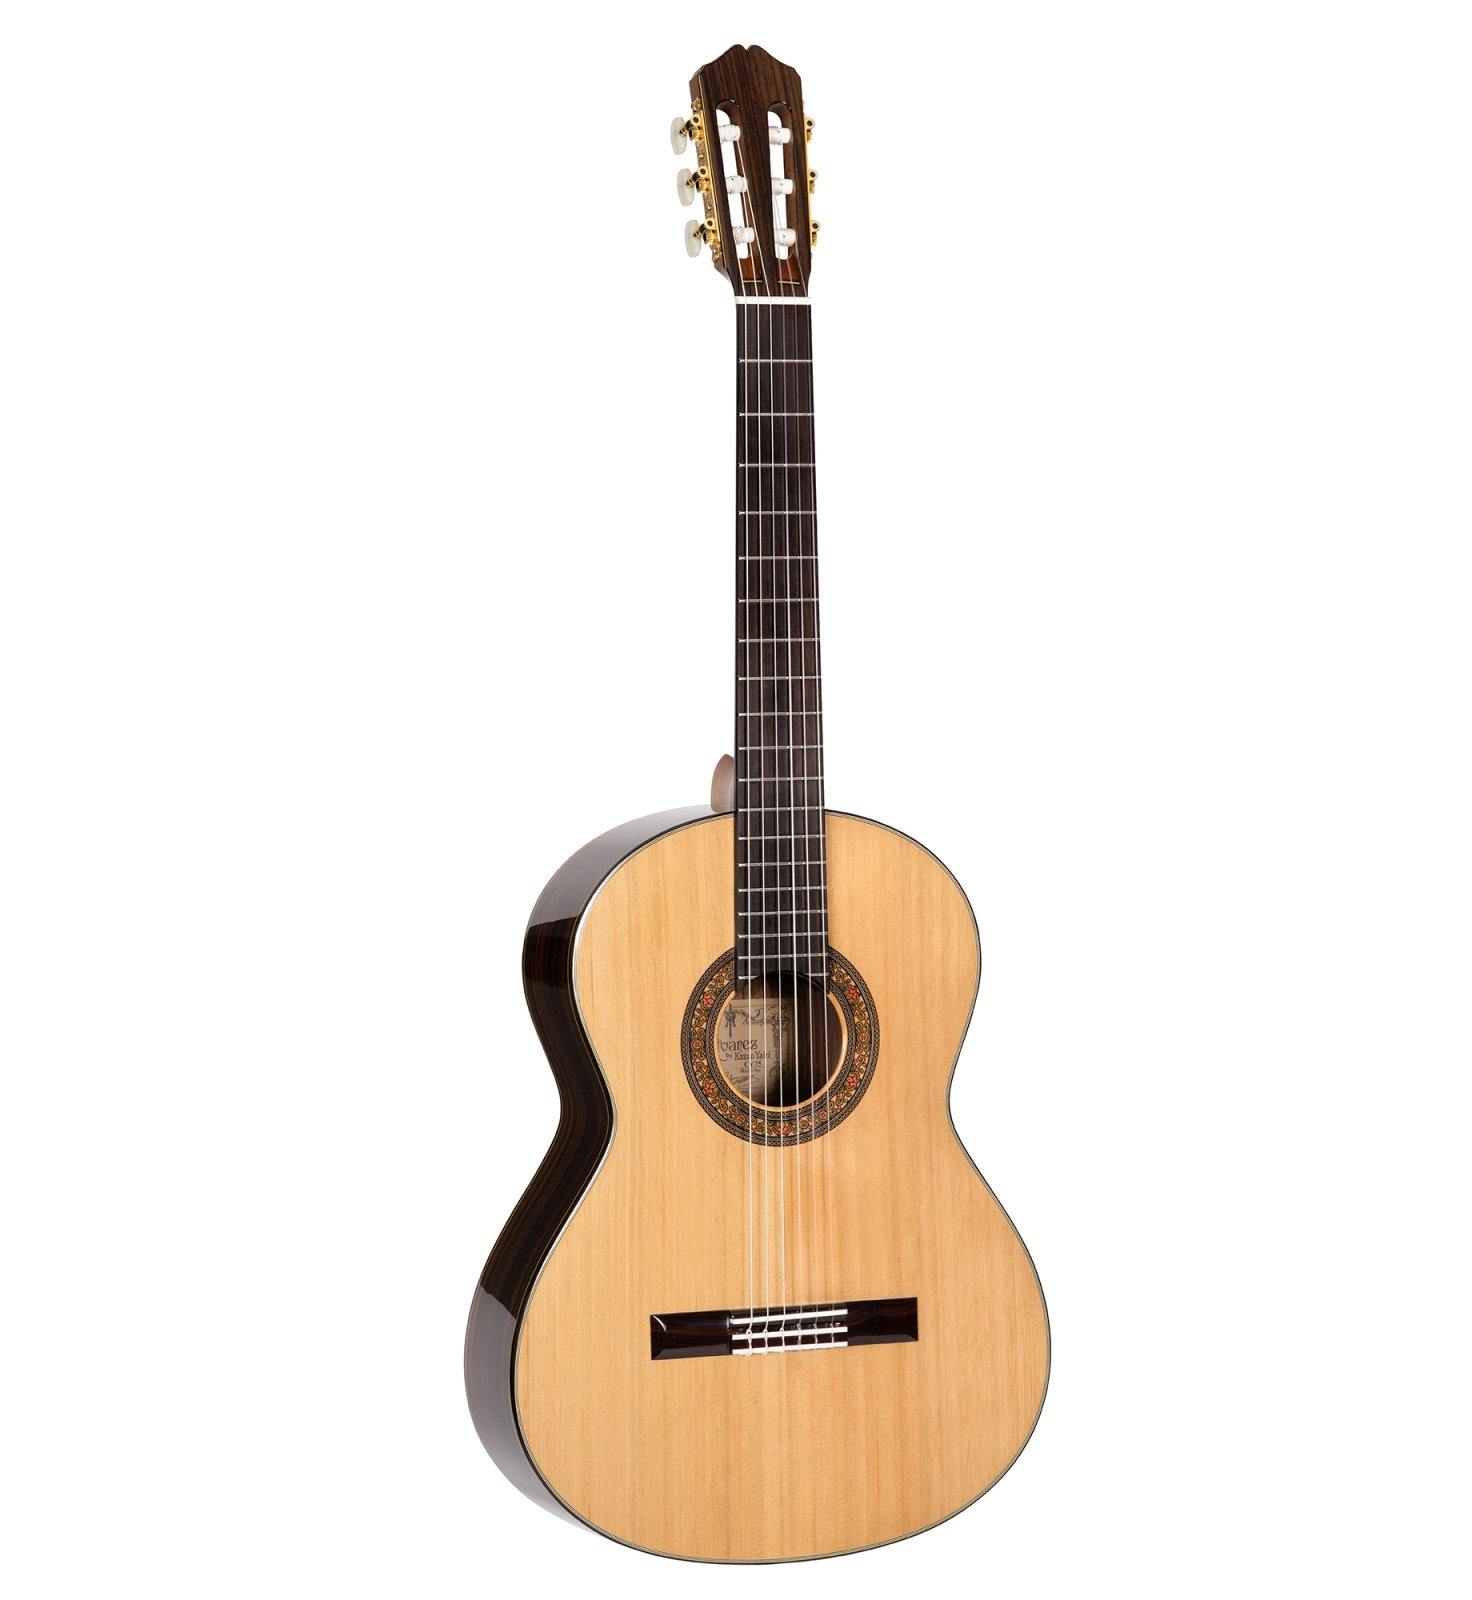 Alvarez-Yairi CY75 Standard Concert Classical Guitar